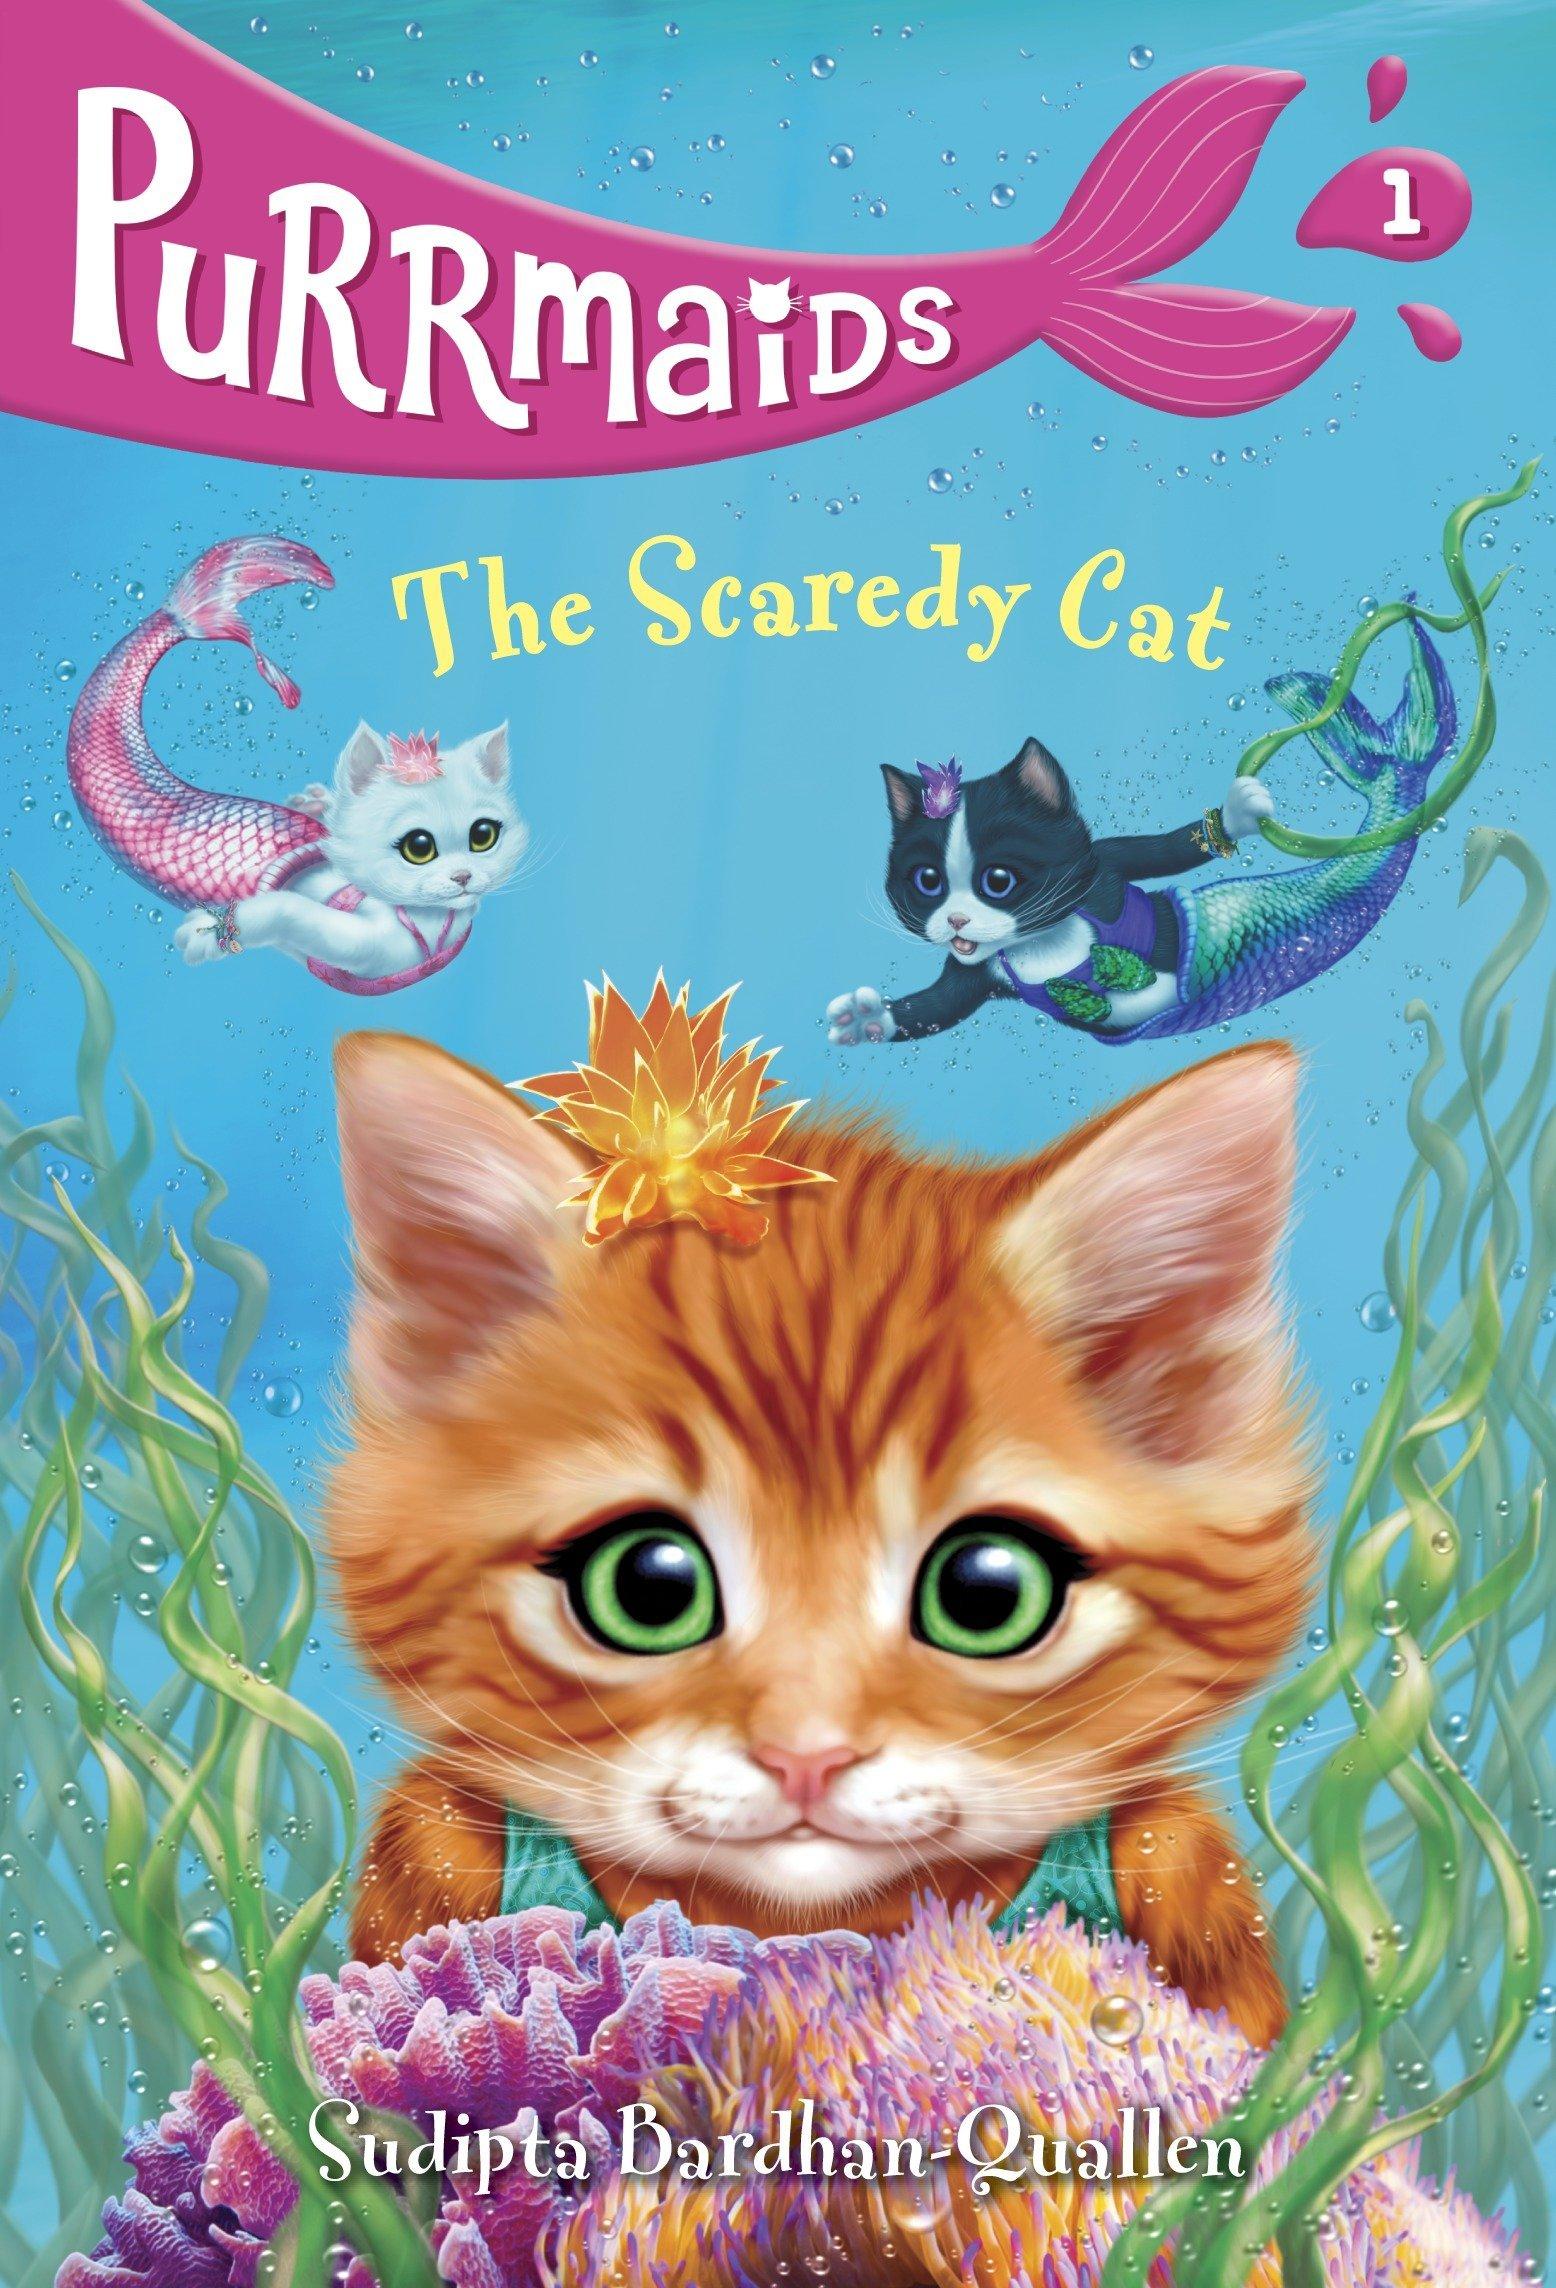 Download Purrmaids #1: The Scaredy Cat ebook